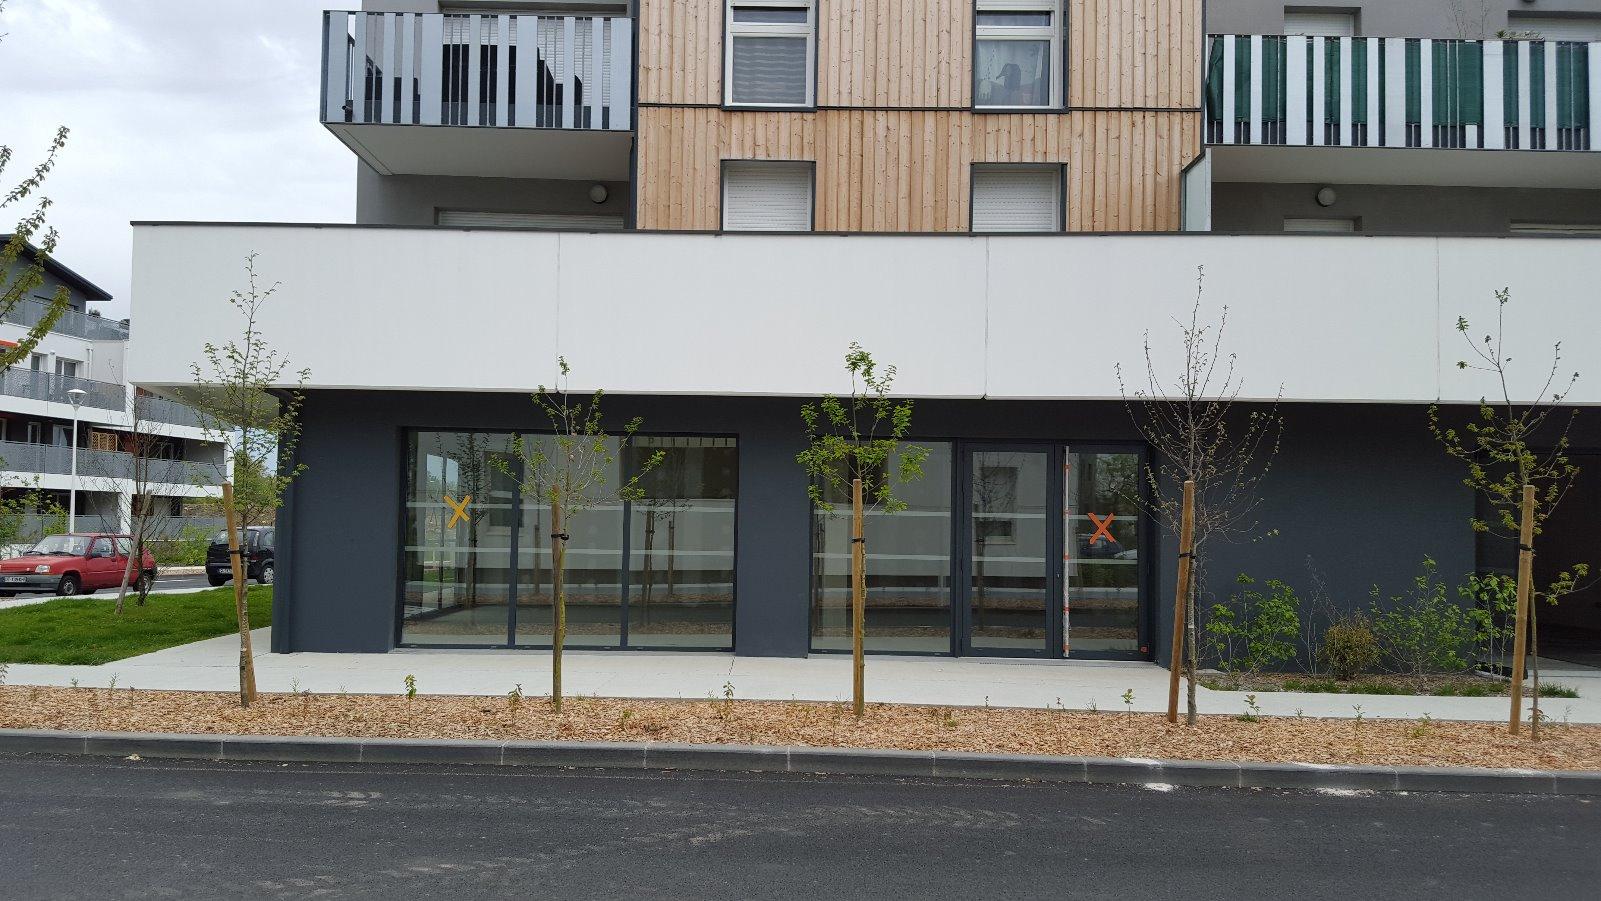 Vente Immobilier Professionnel Local commercial Villenave-d'Ornon (33140)